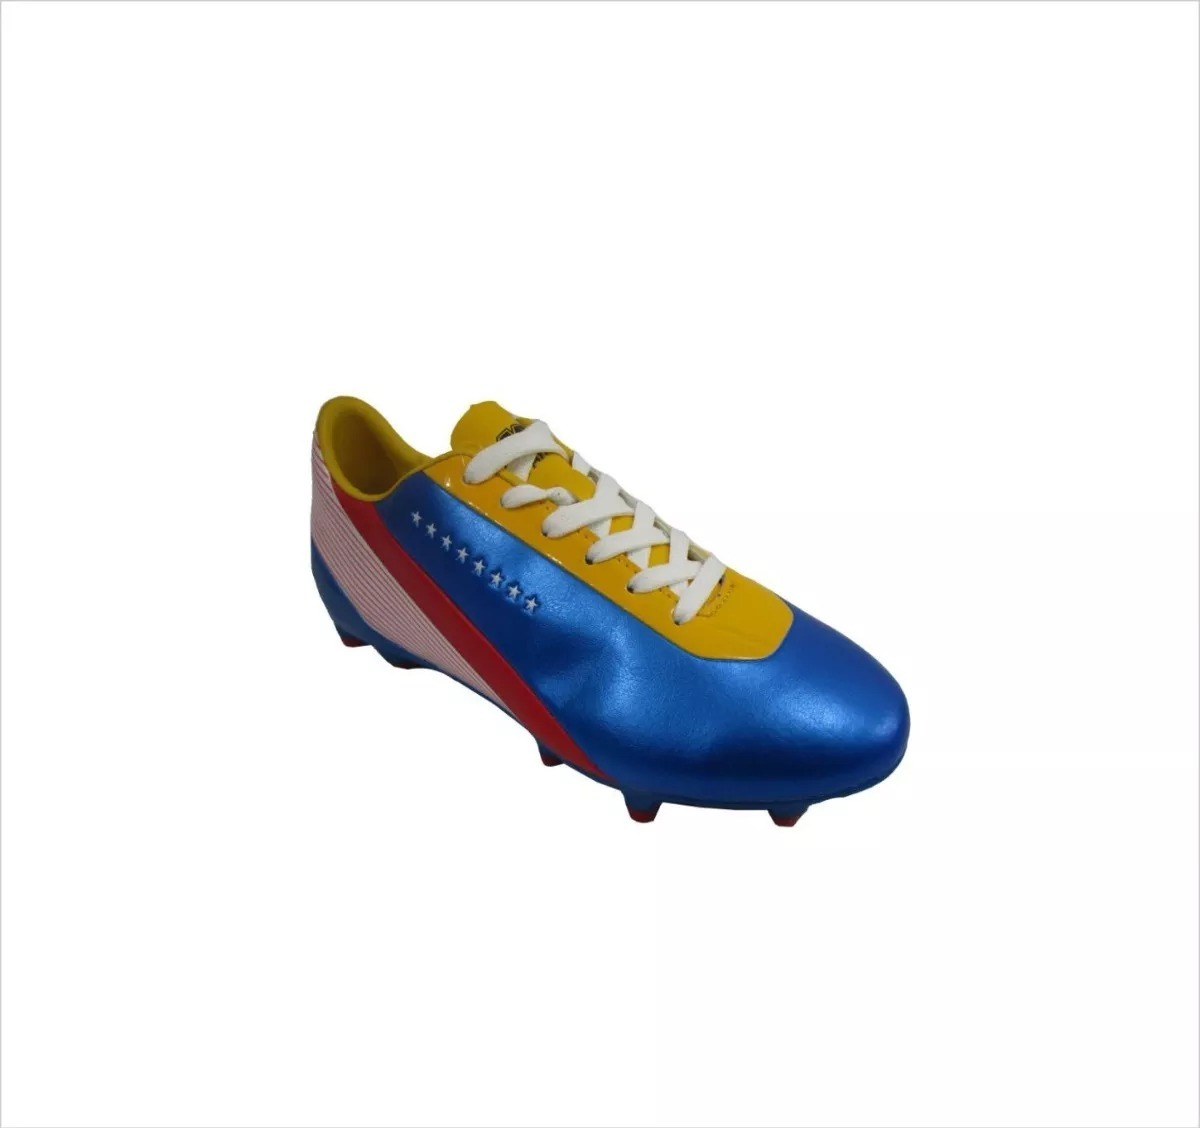 ee249399bc0d3 Tacos Guayos De Futbol New Arival Tricolor Venezuela - Bs. 150.000 ...